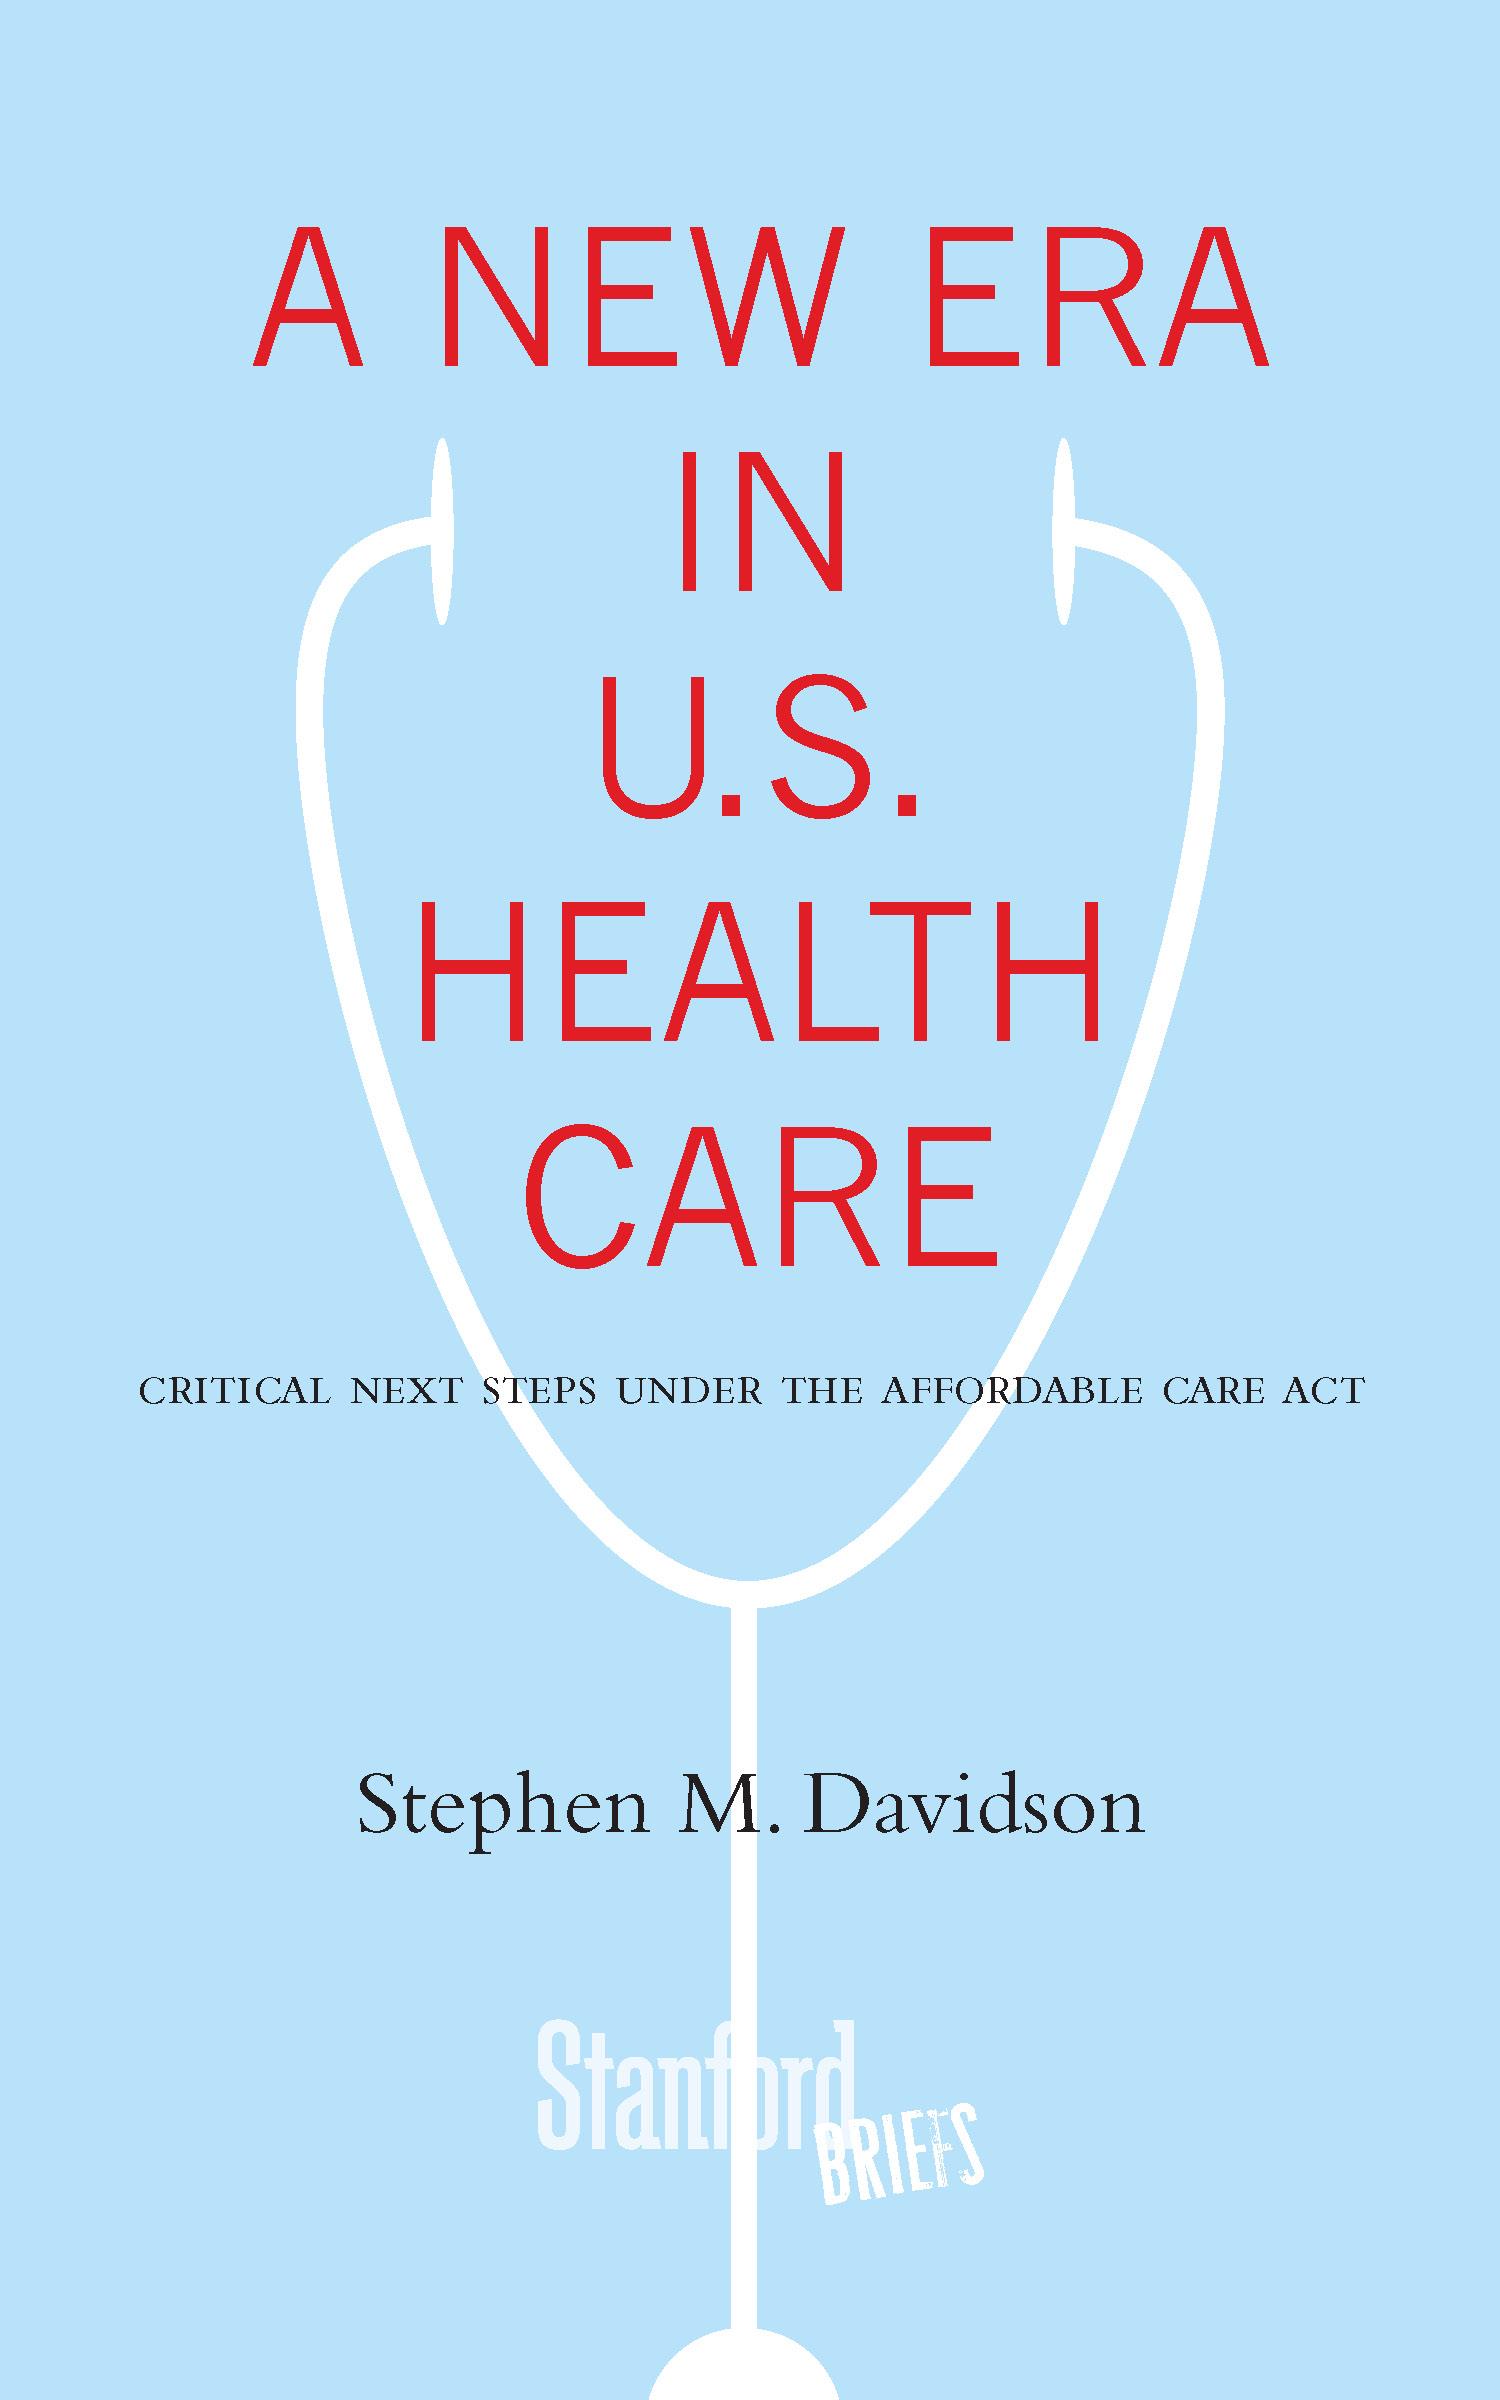 Download Ebook A New Era in U.S. Health Care by Stephen Davidson Pdf